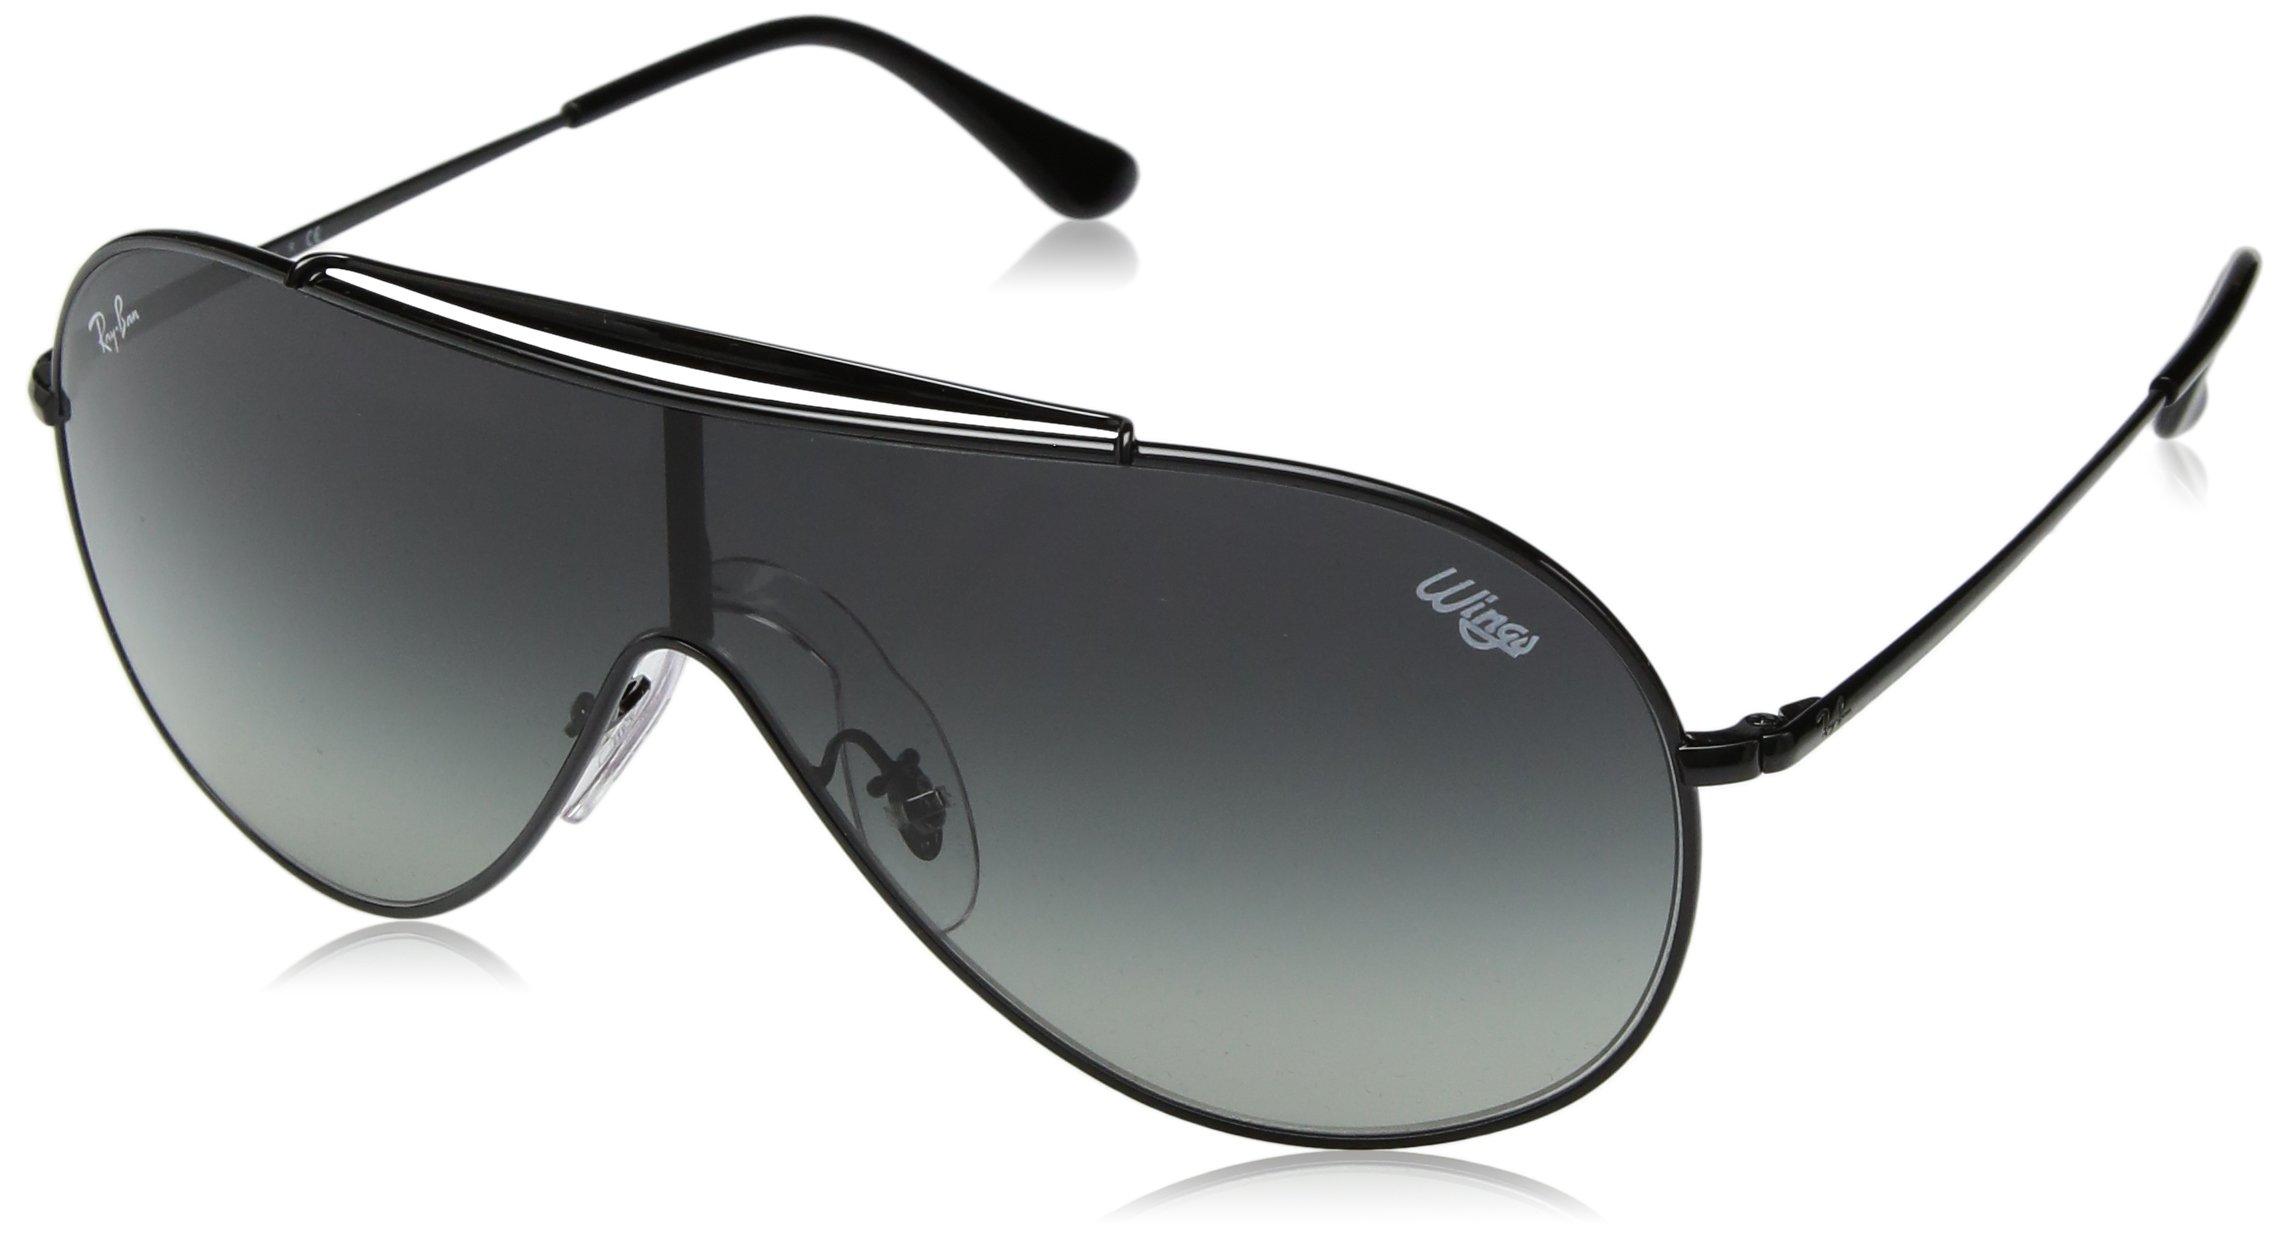 e5f39696c5ef4b Ray-Ban 0rb3597 Aviator Sunglasses